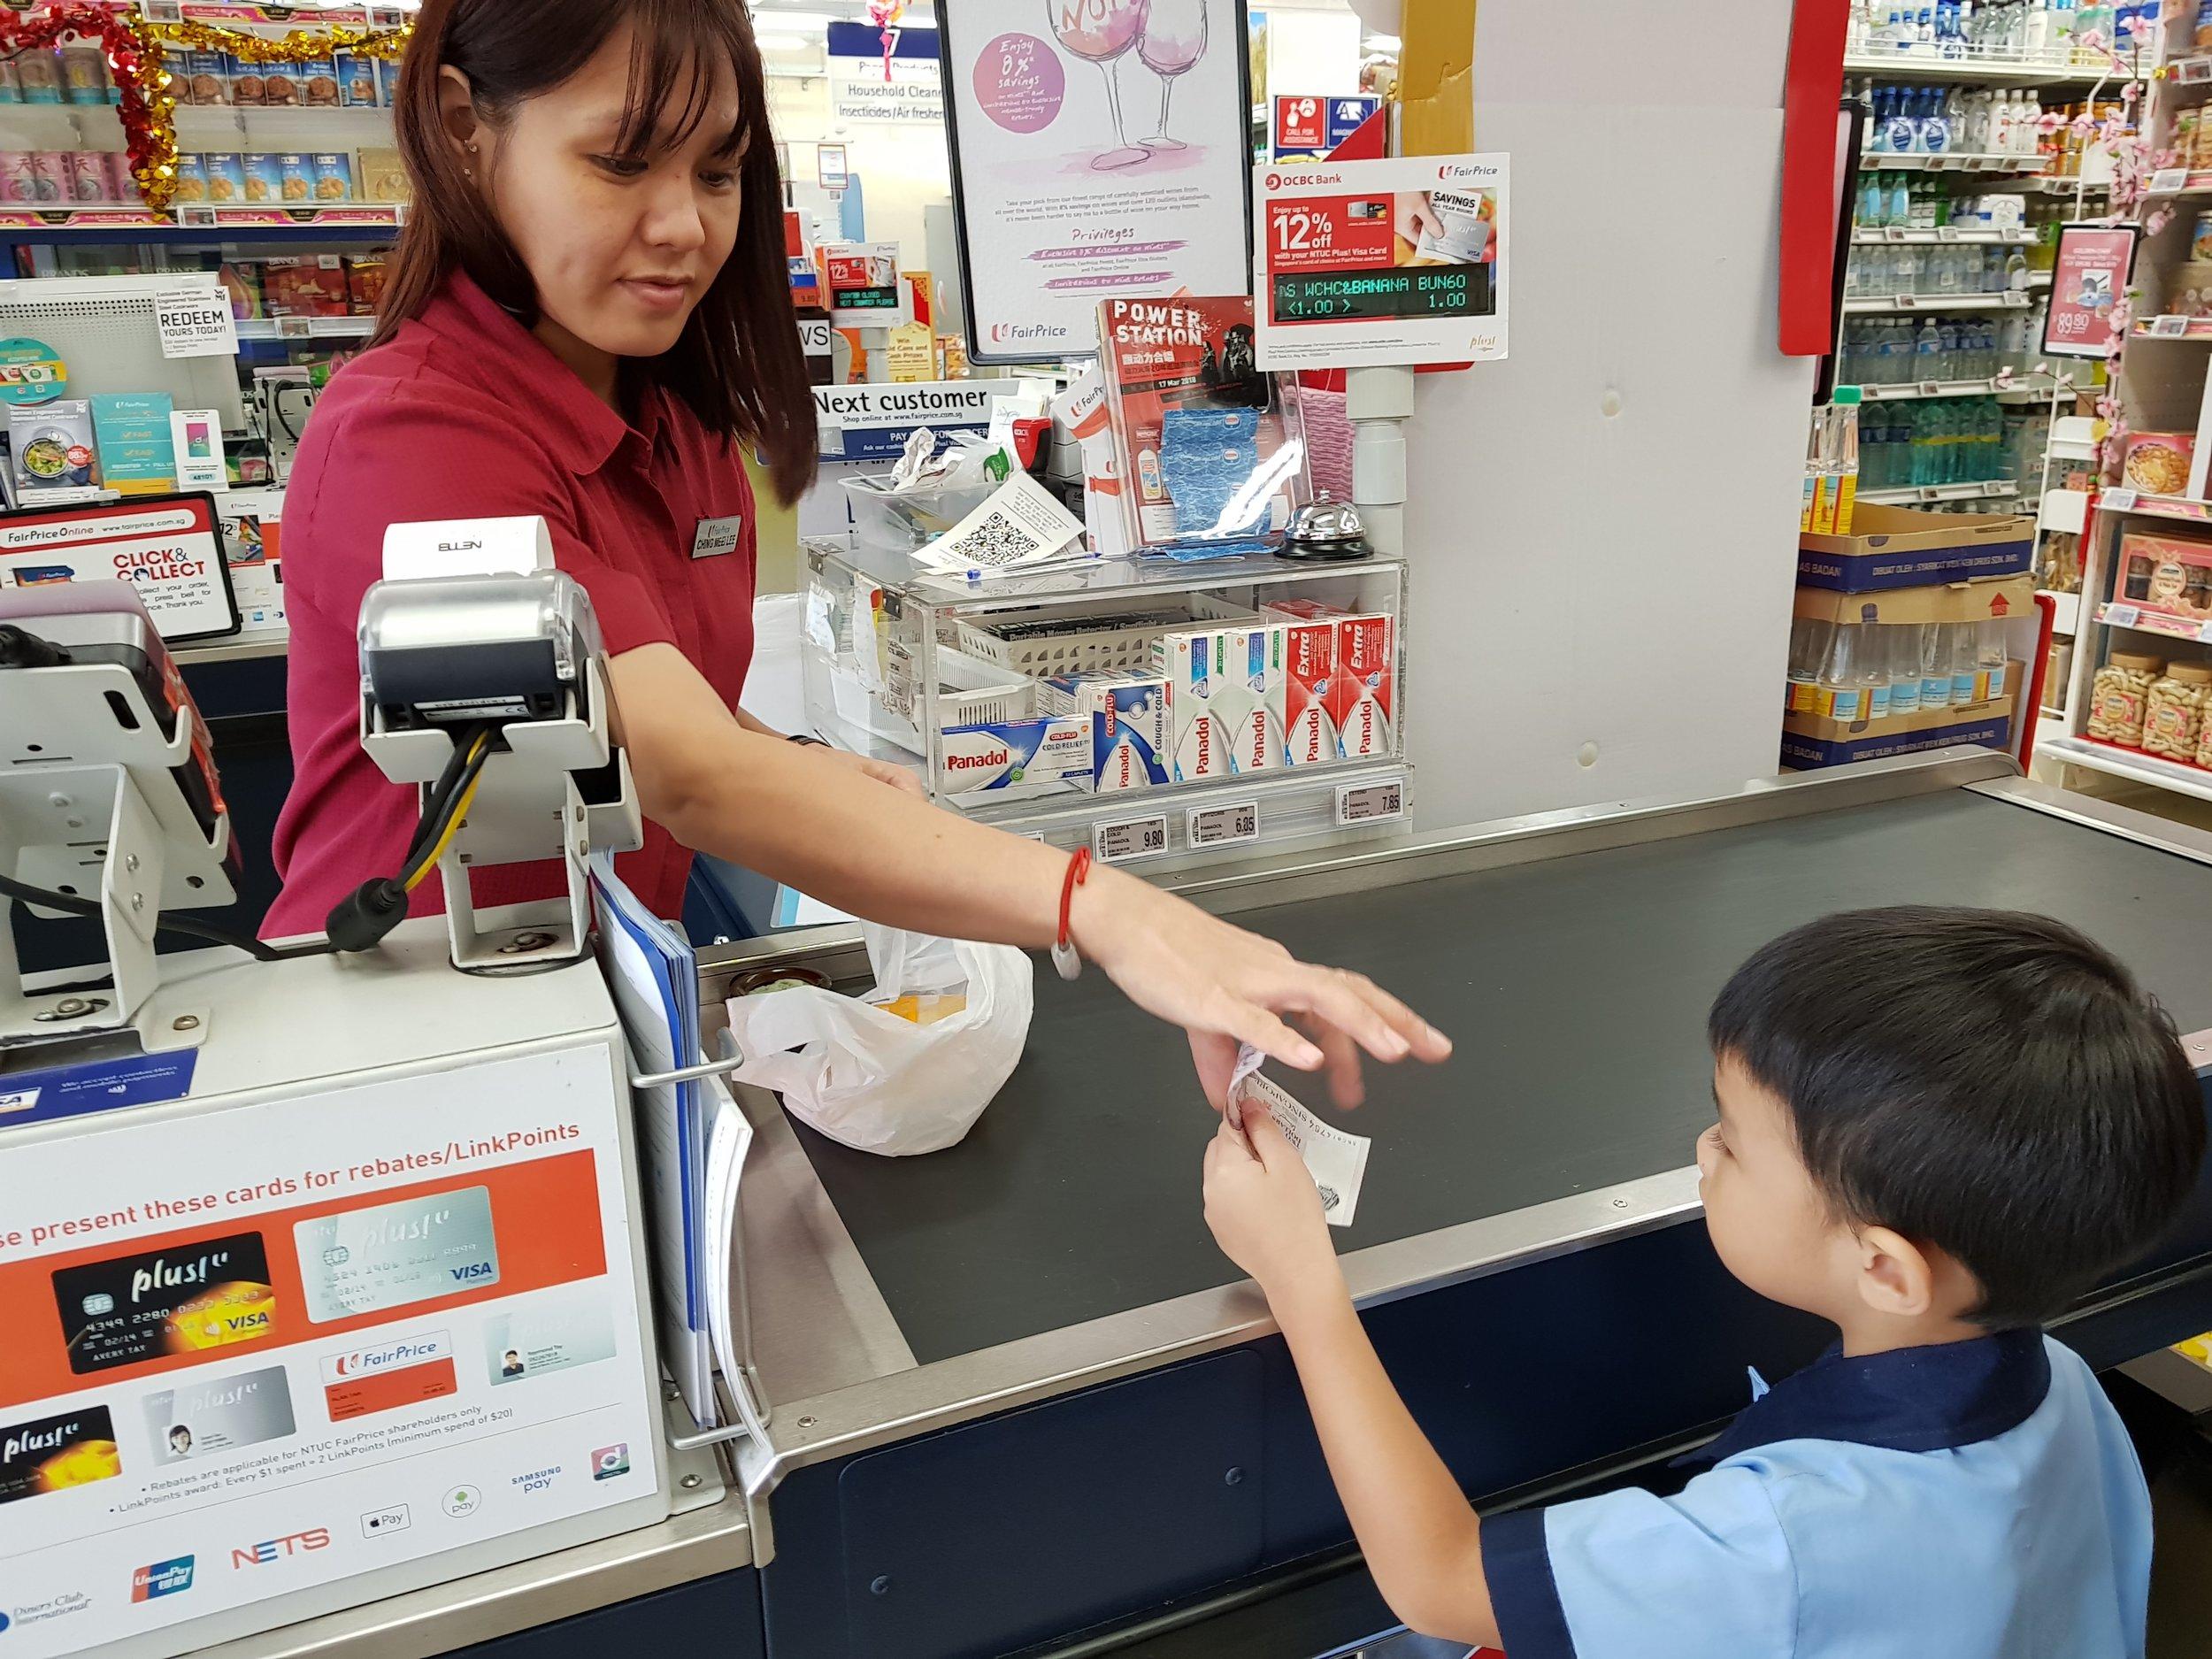 Alora Supermarket Visit 7 (27 February 2018).jpg